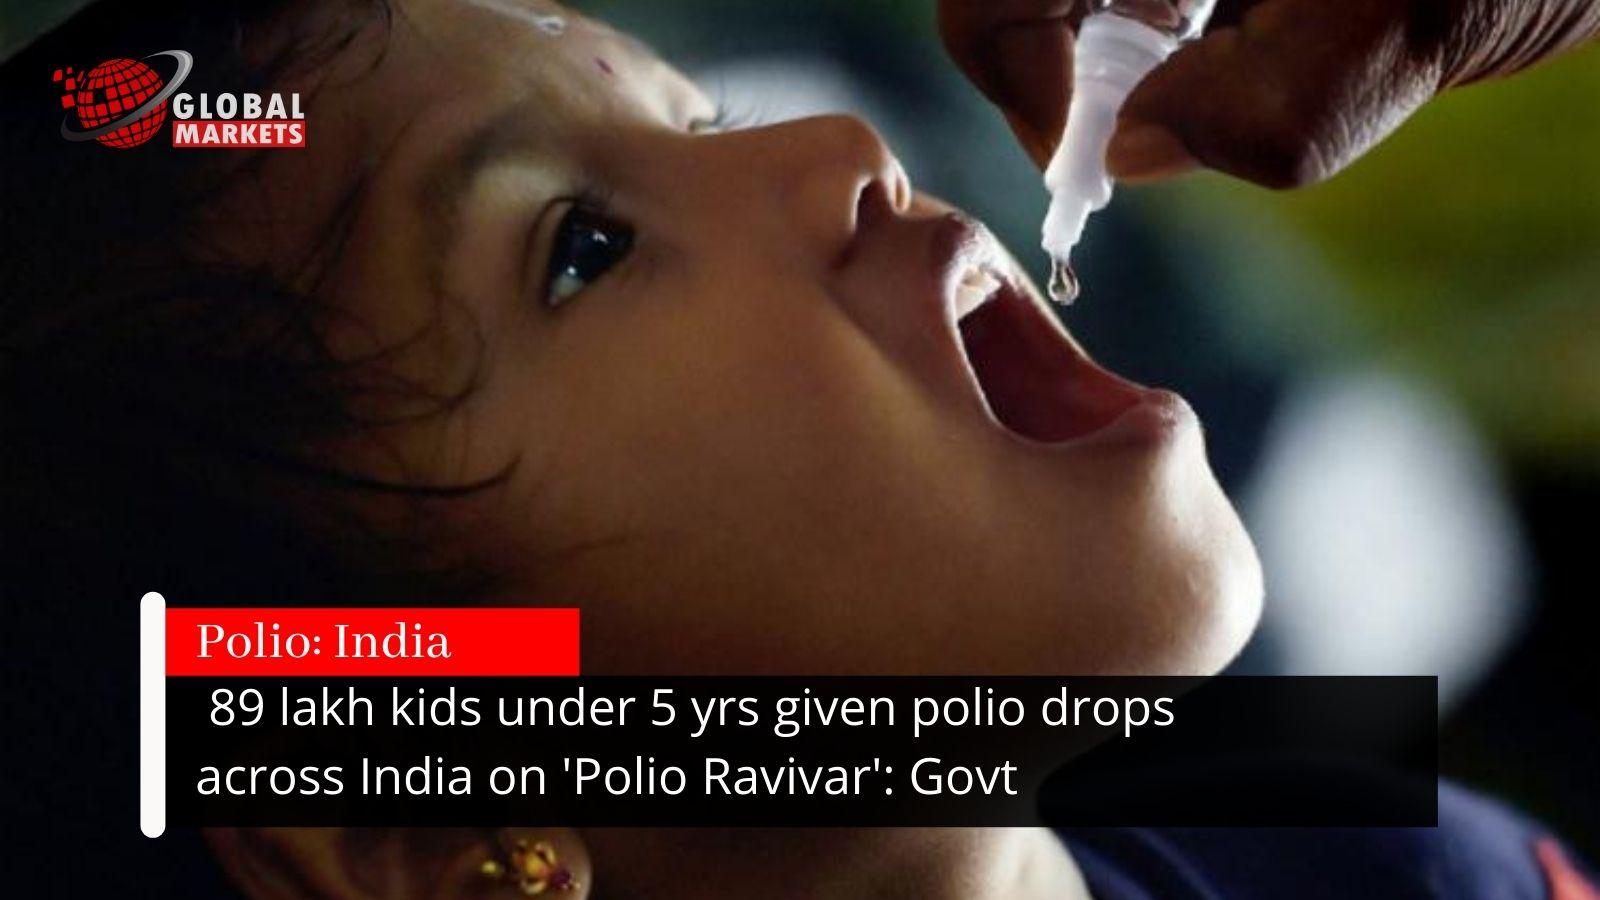 89 lakh kids given polio drops across India on 'Polio Ravivar'